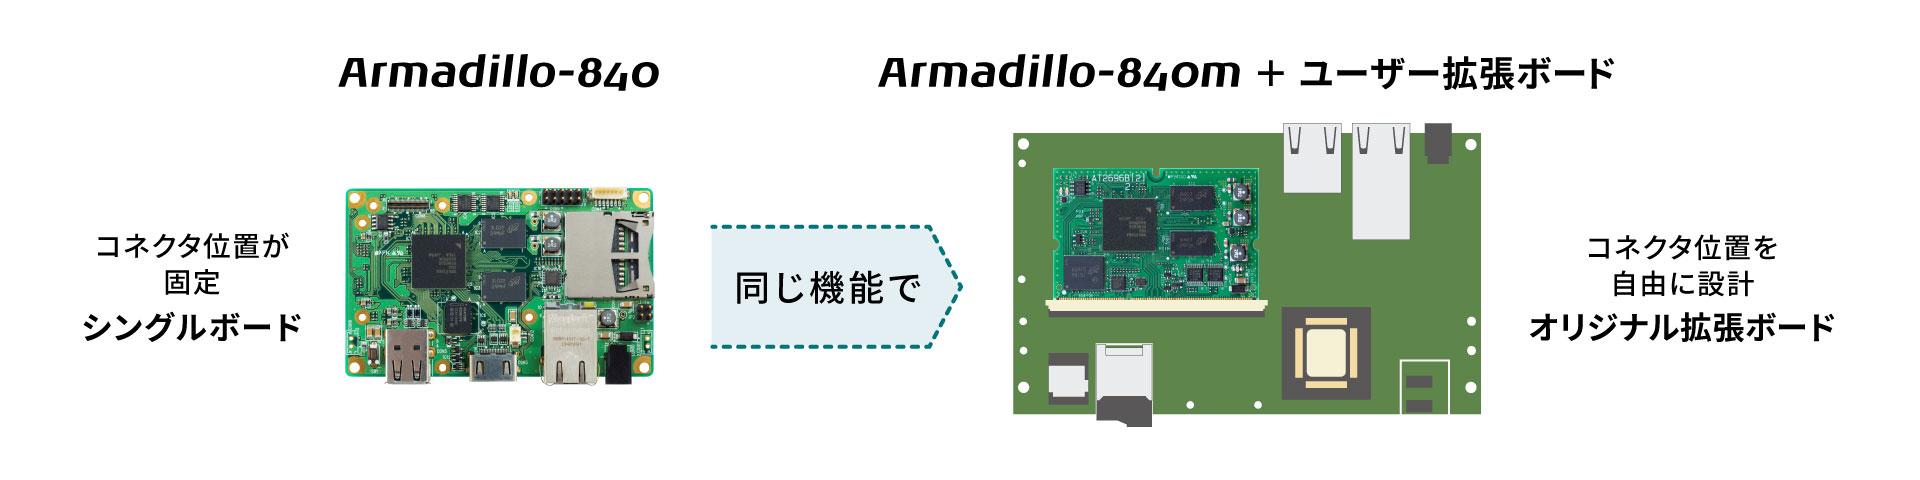 Armadillo-840の特長